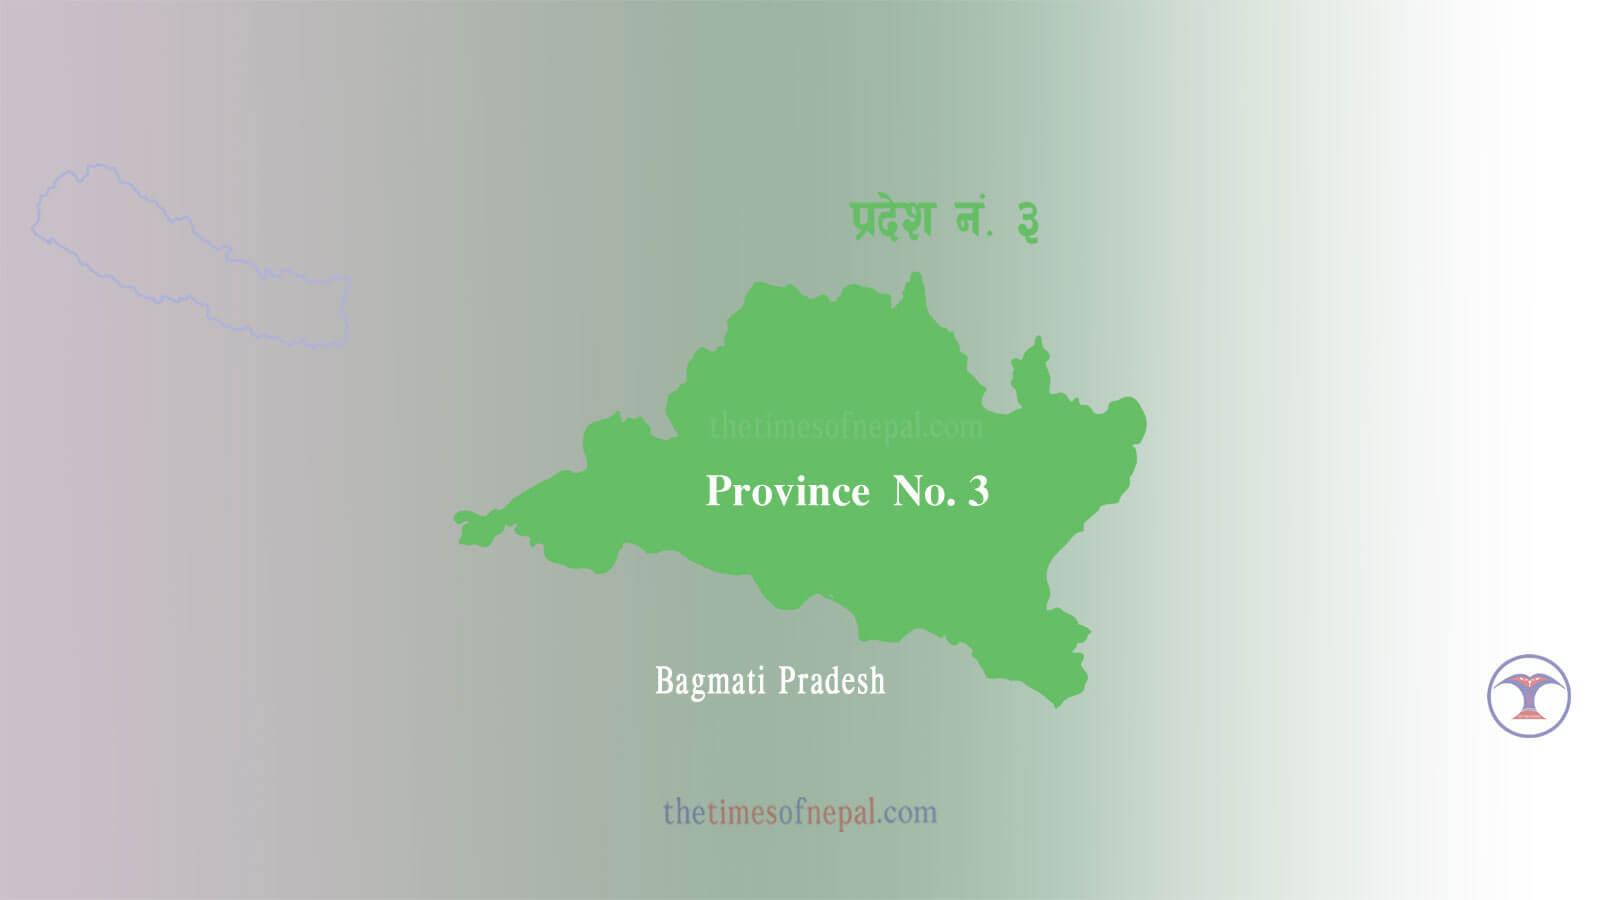 Bagmati Pradesh - The Times Of Nepal